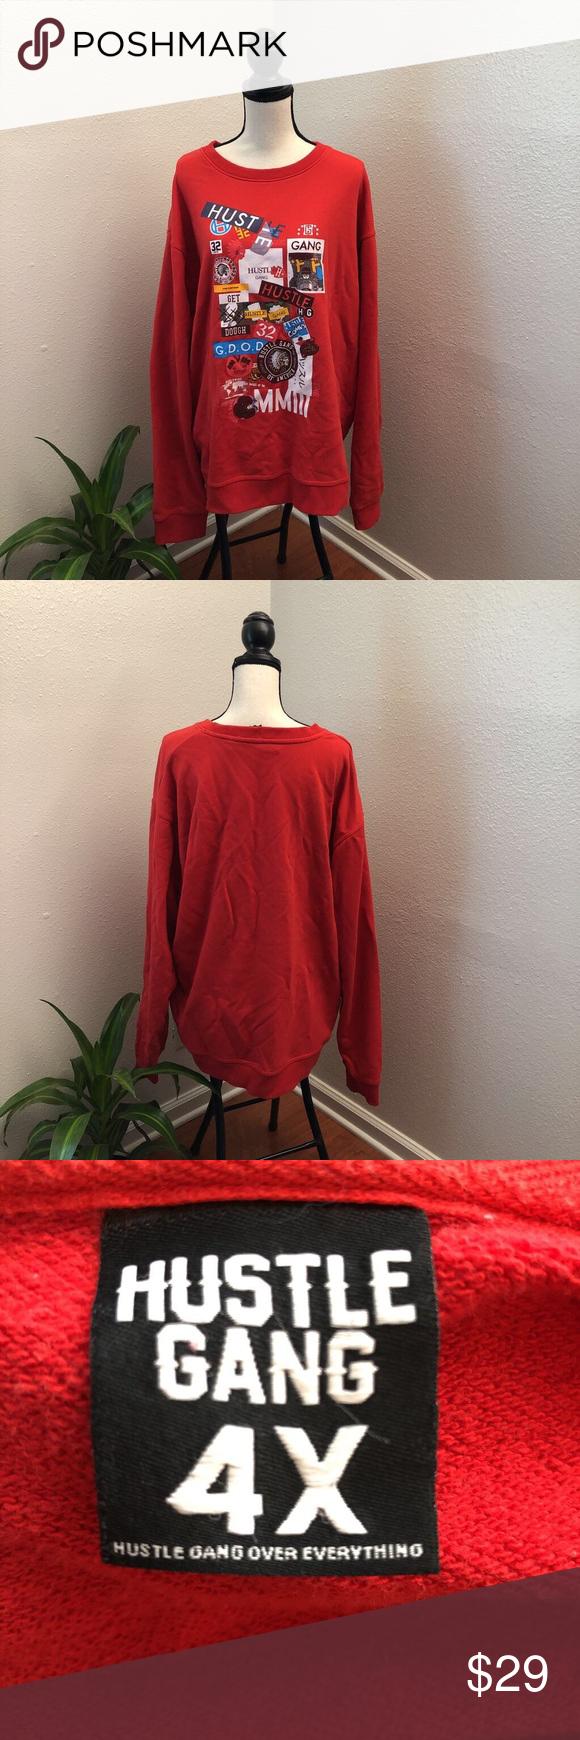 Hustle Gang Red Sweatshirt Red Sweatshirts Sweatshirts Cotton Pullover [ 1740 x 580 Pixel ]